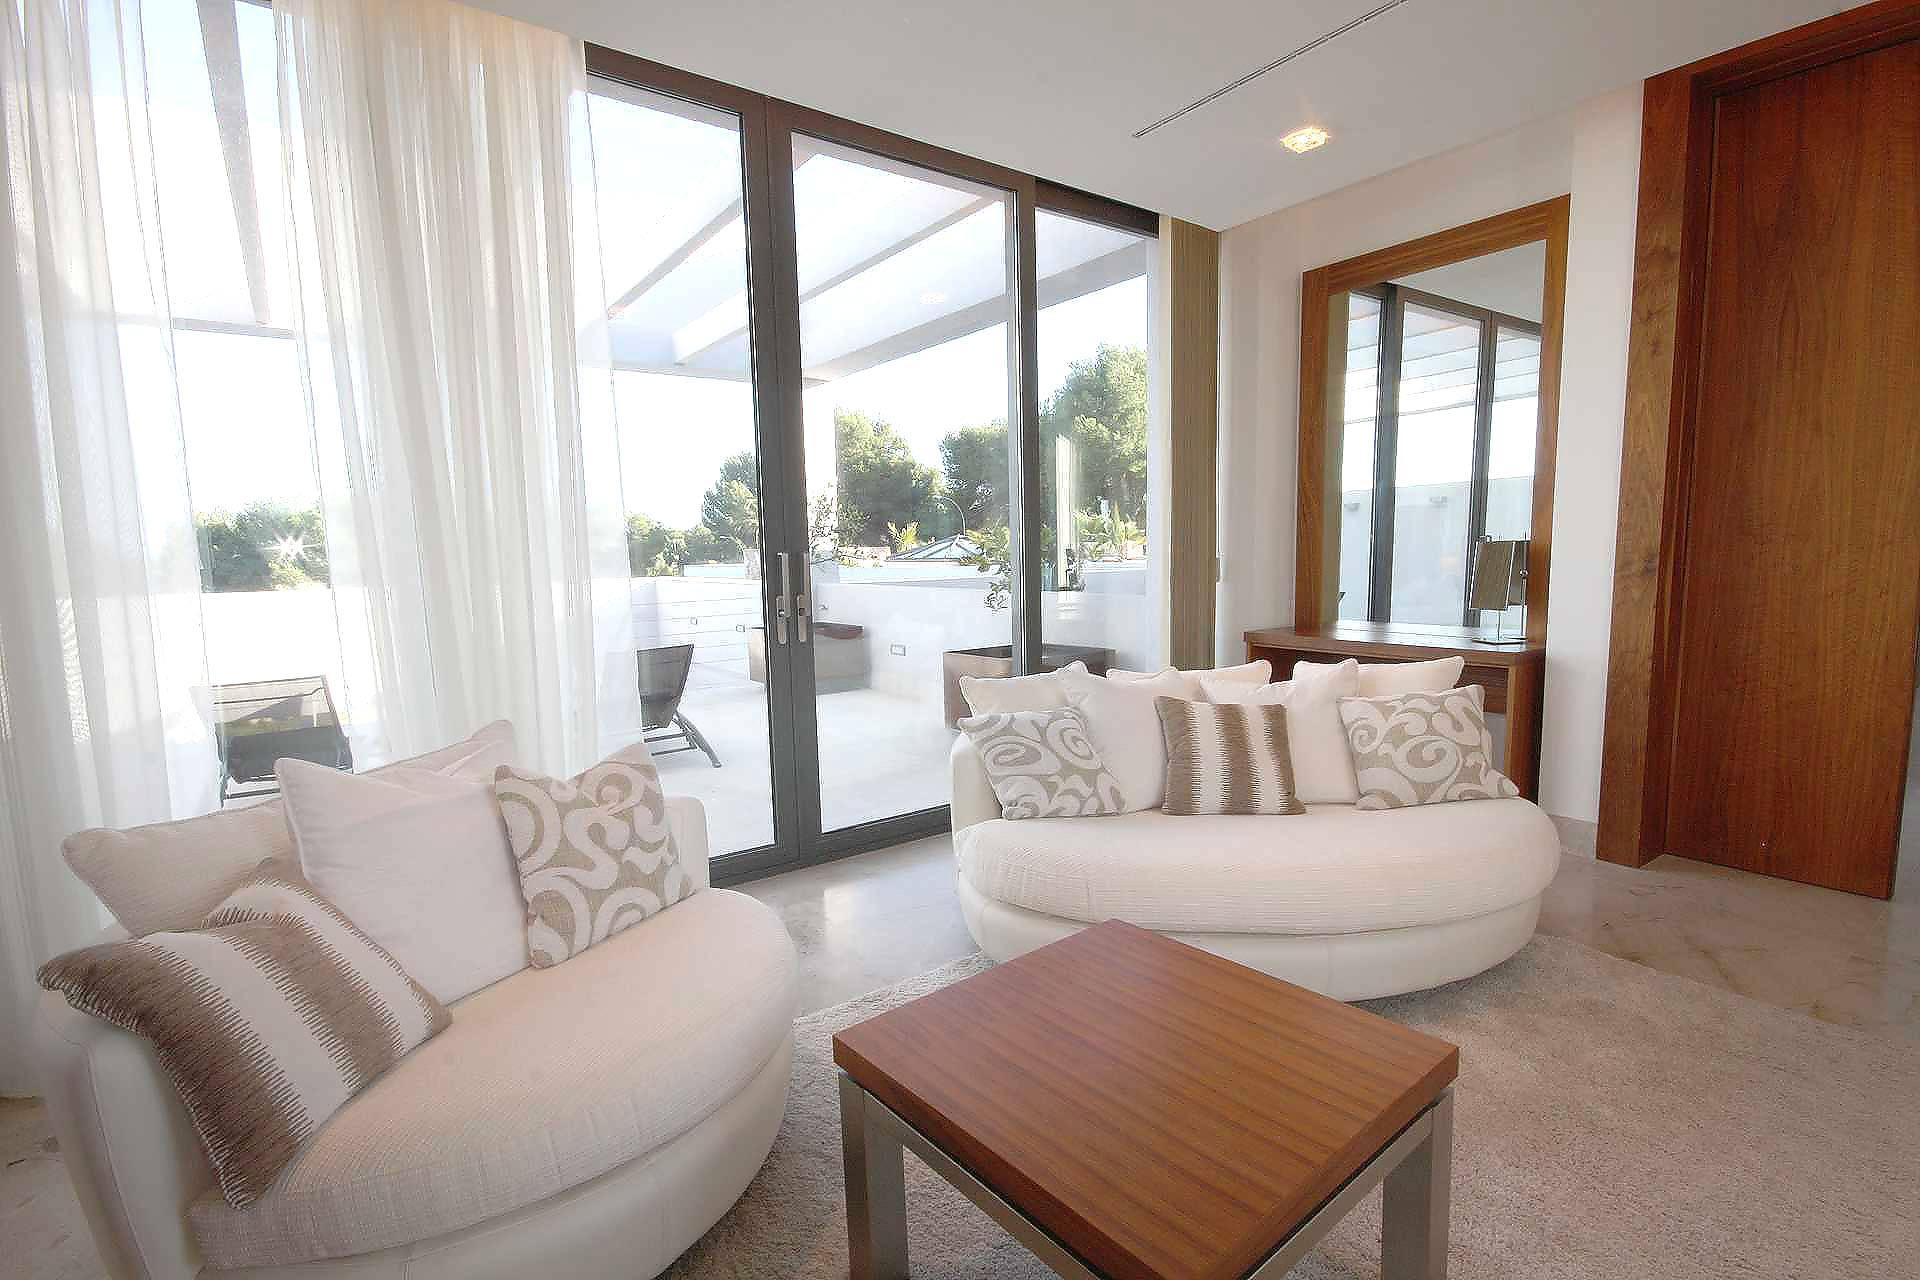 01-92 Design Villa Mallorca Südwesten Bild 42